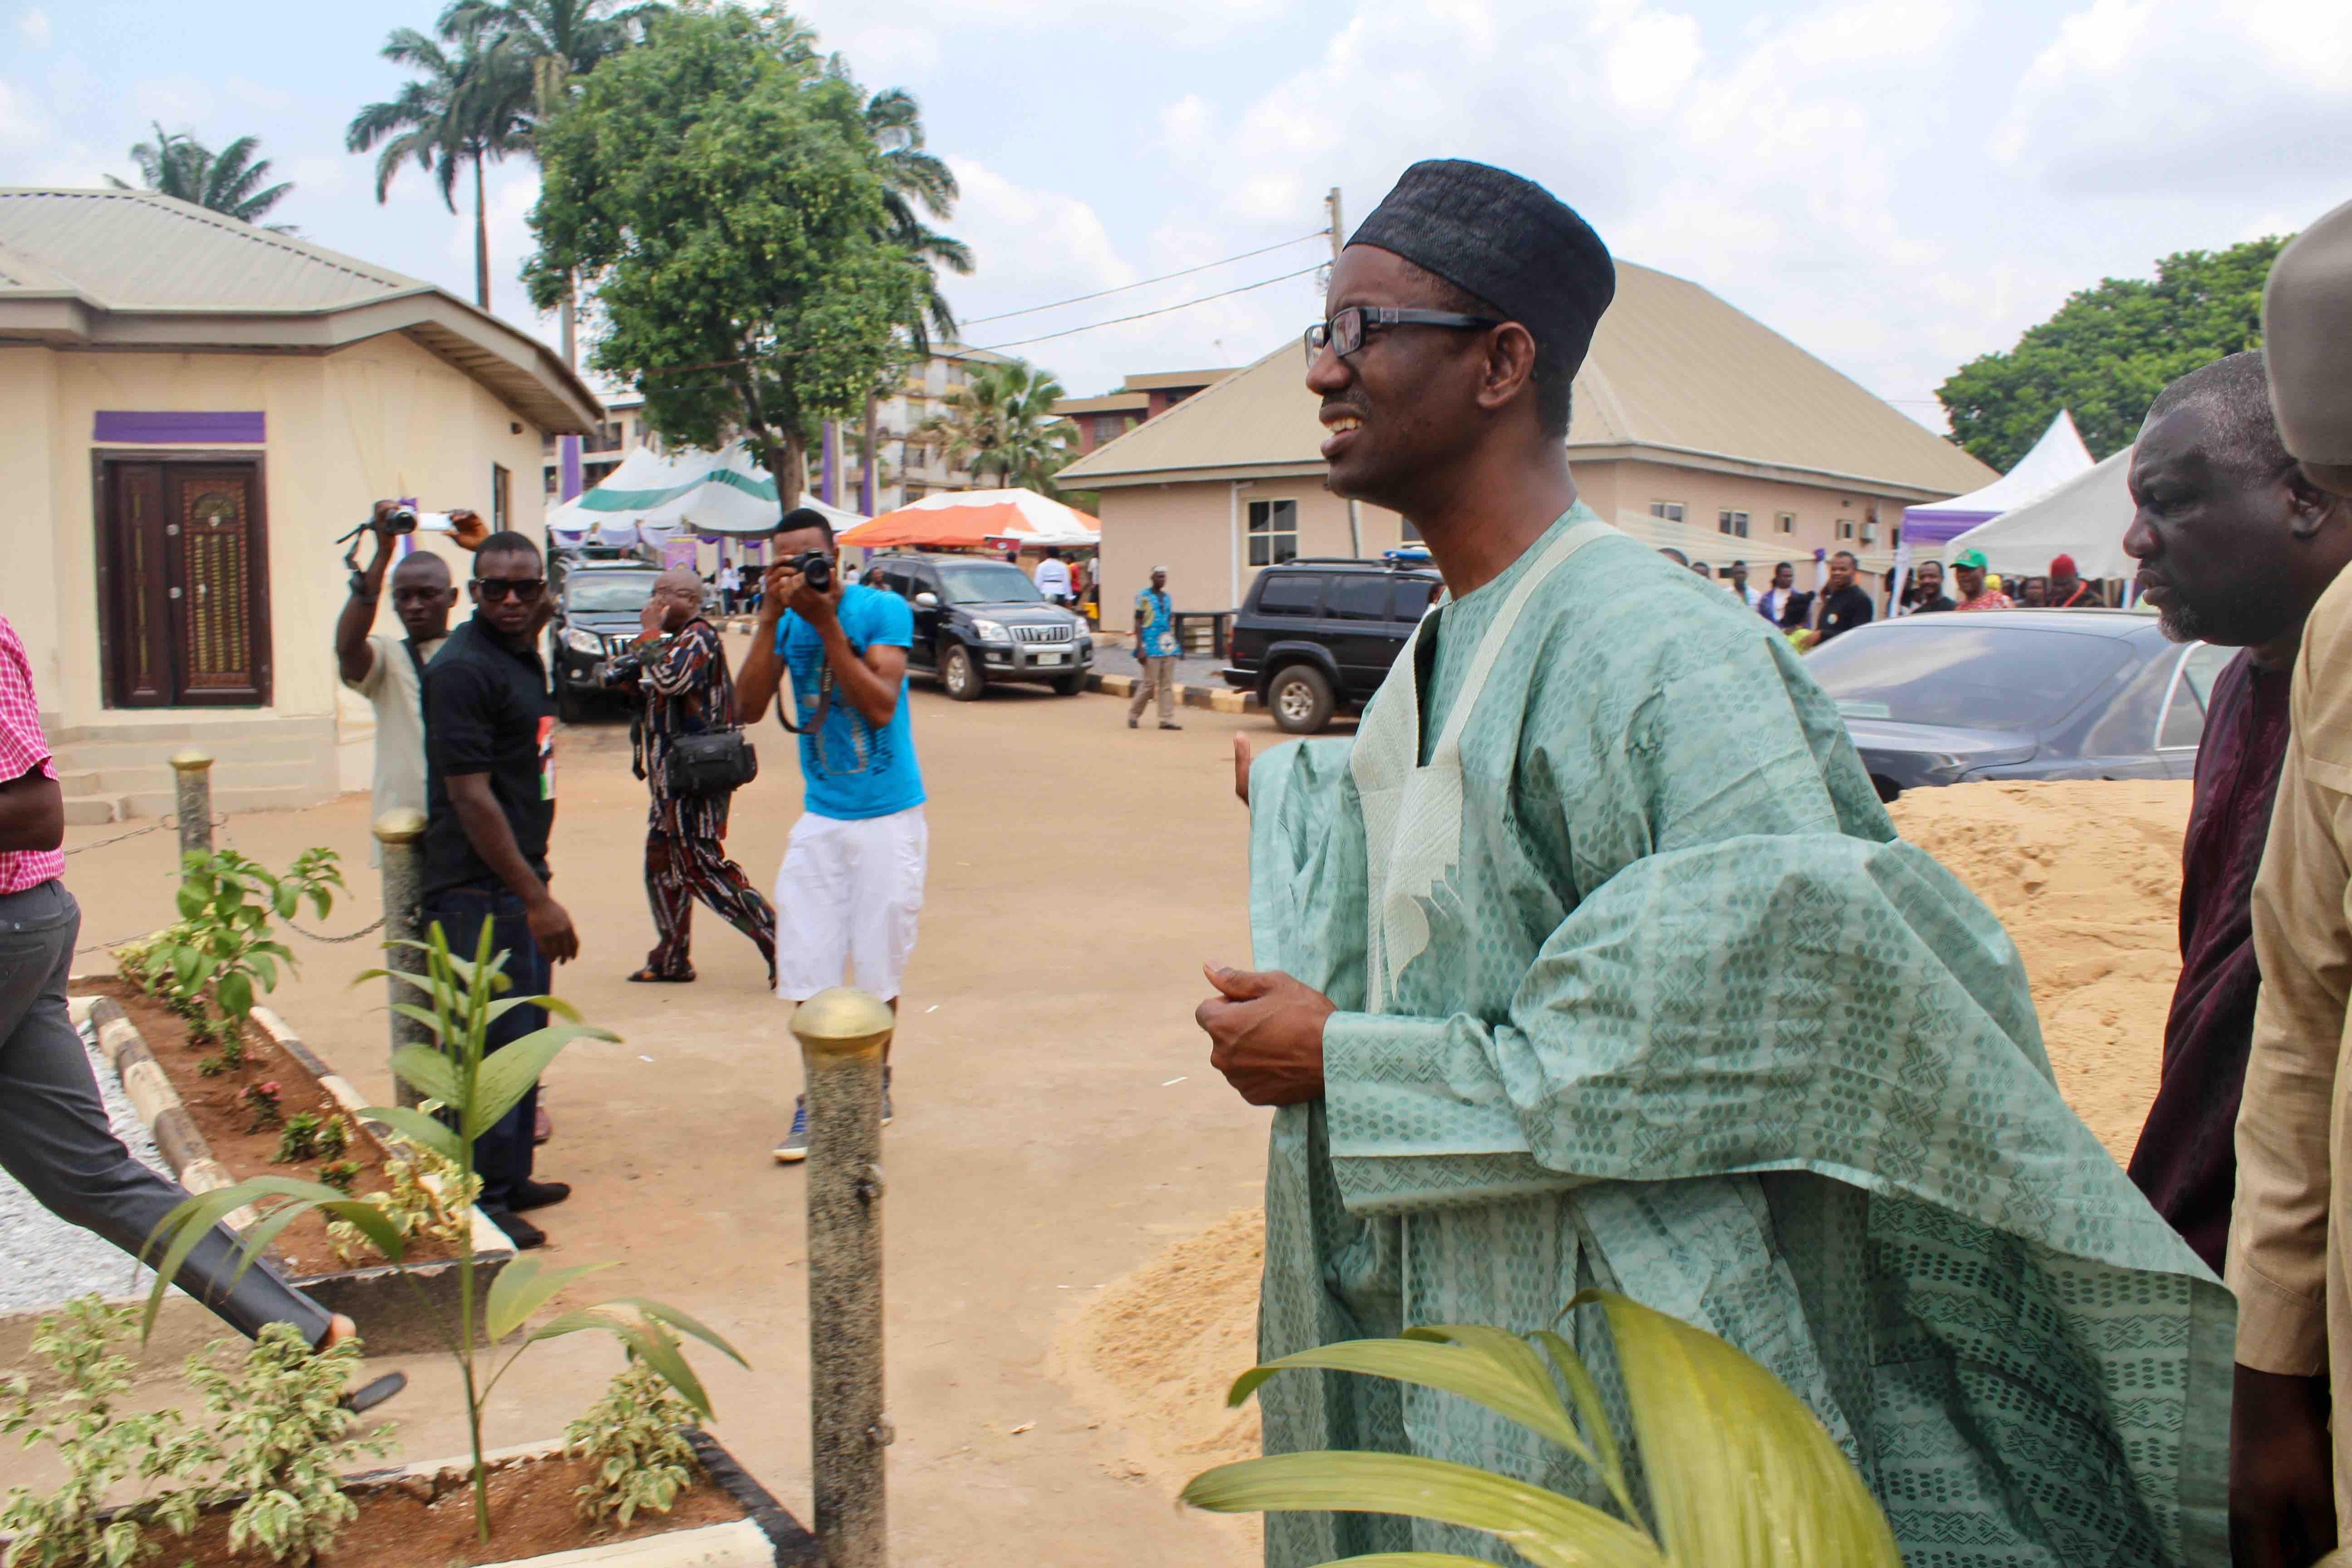 Nuhu Ribadu, Nnewi, Anambra State, Nigeria. #JujuFilms